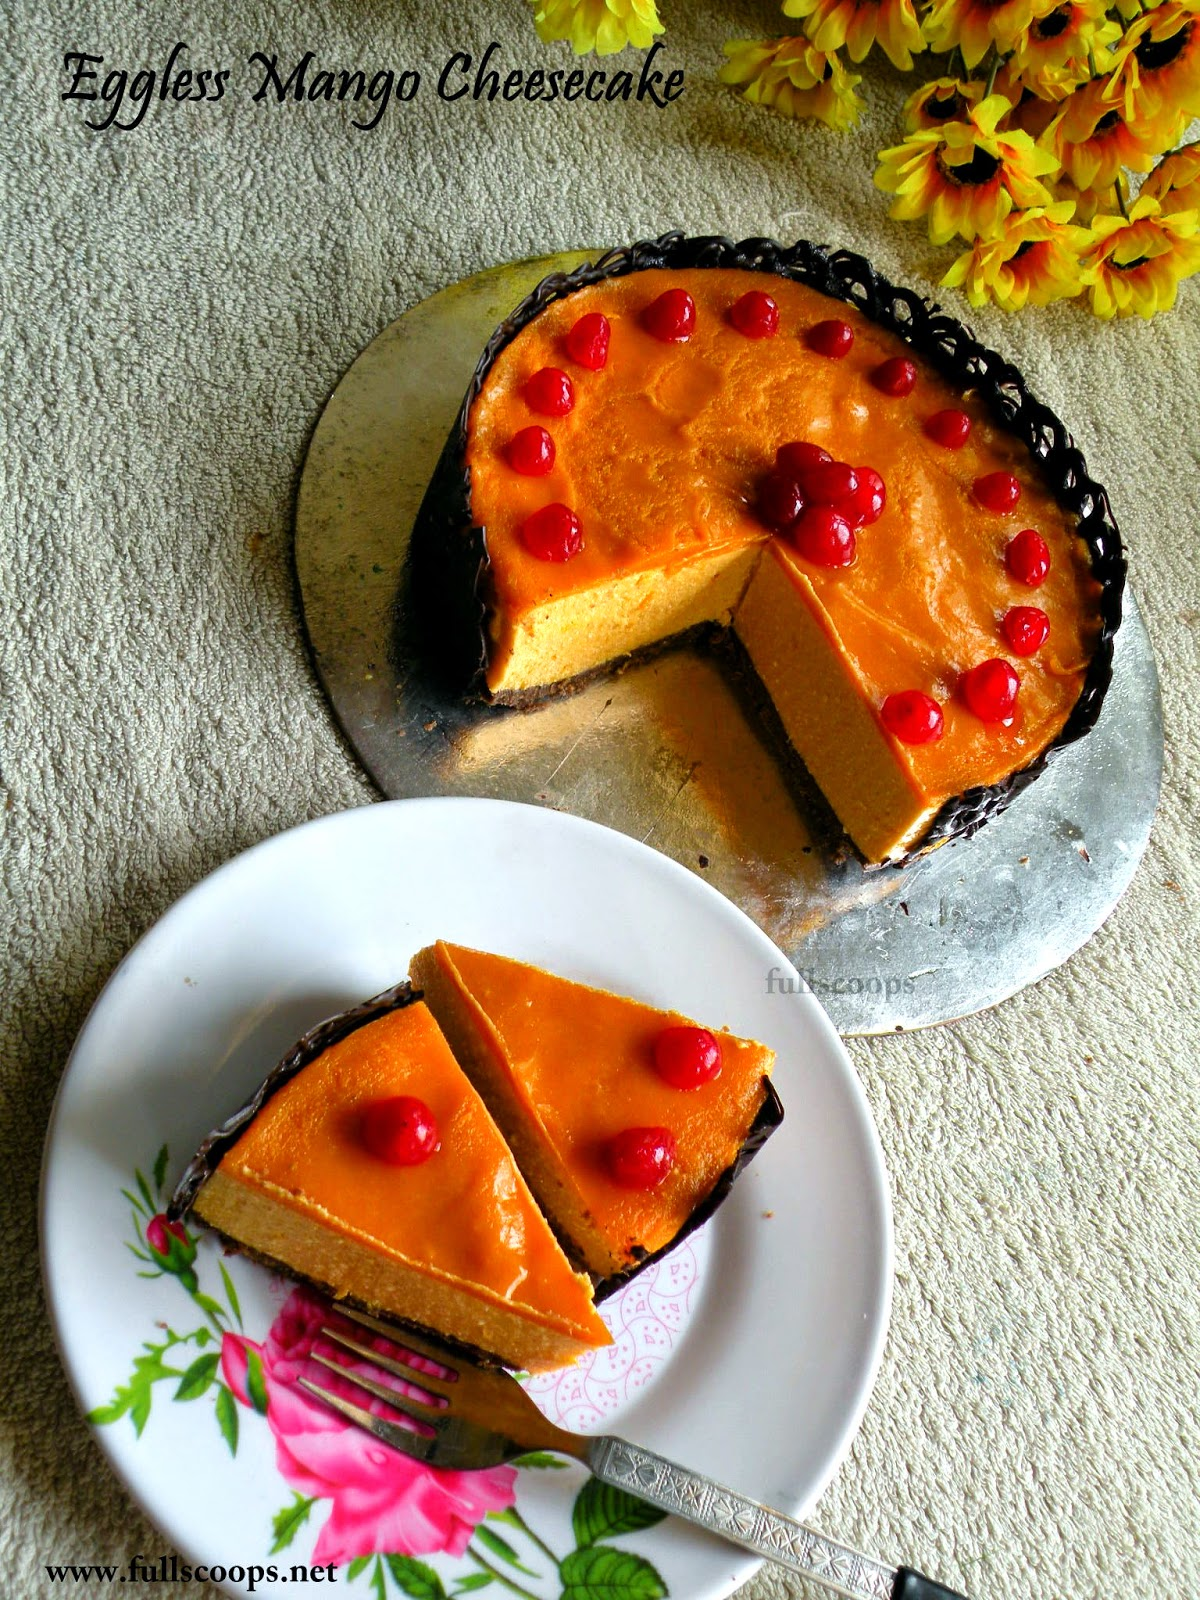 Can You Make A Regular Cake In A Springform Pan